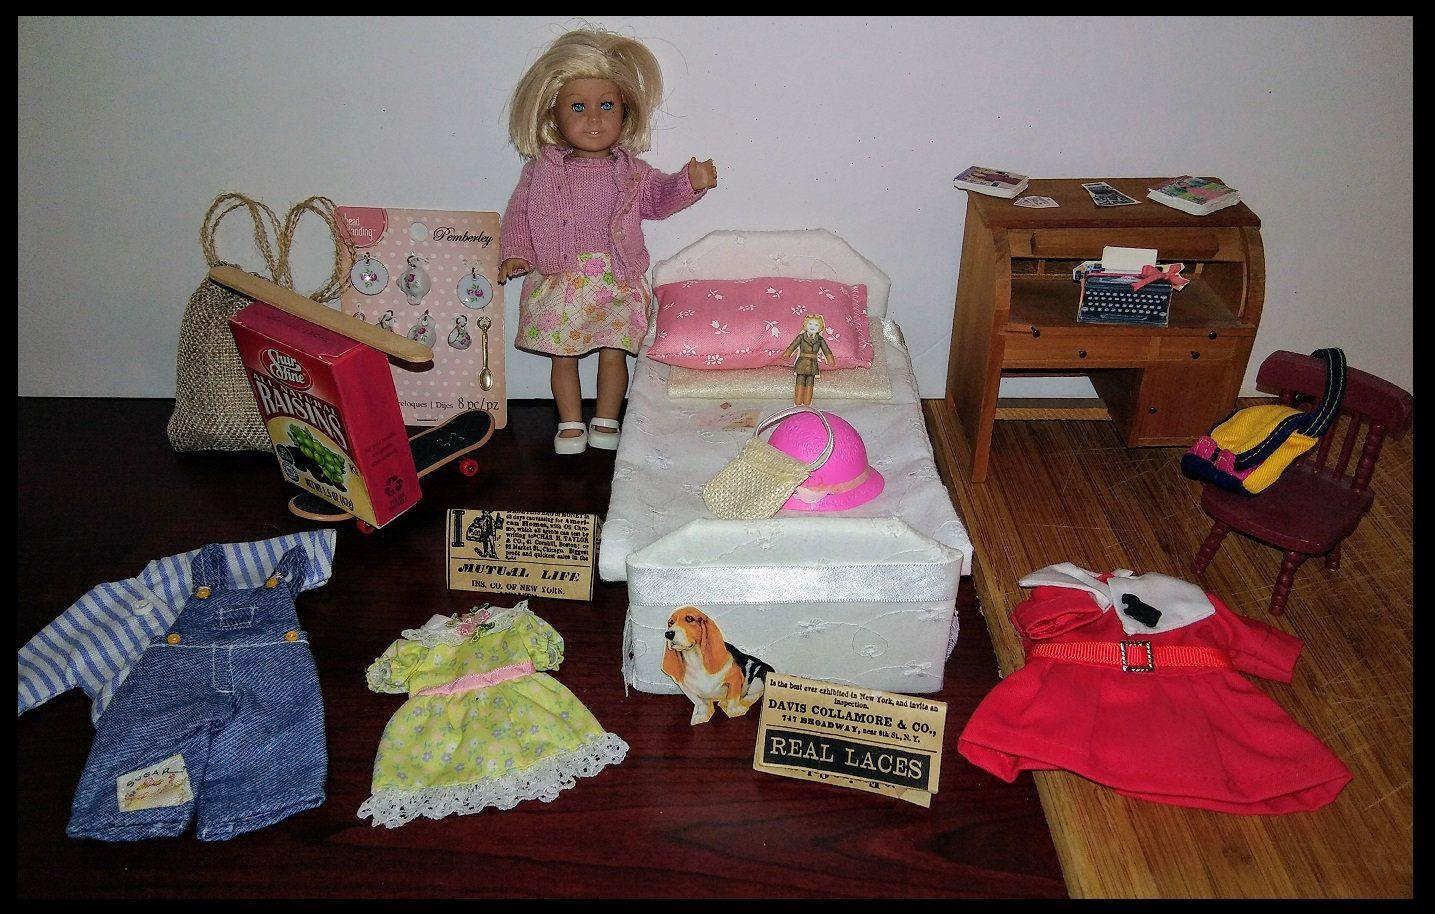 American Girl Mini Kit Kittredge Collection